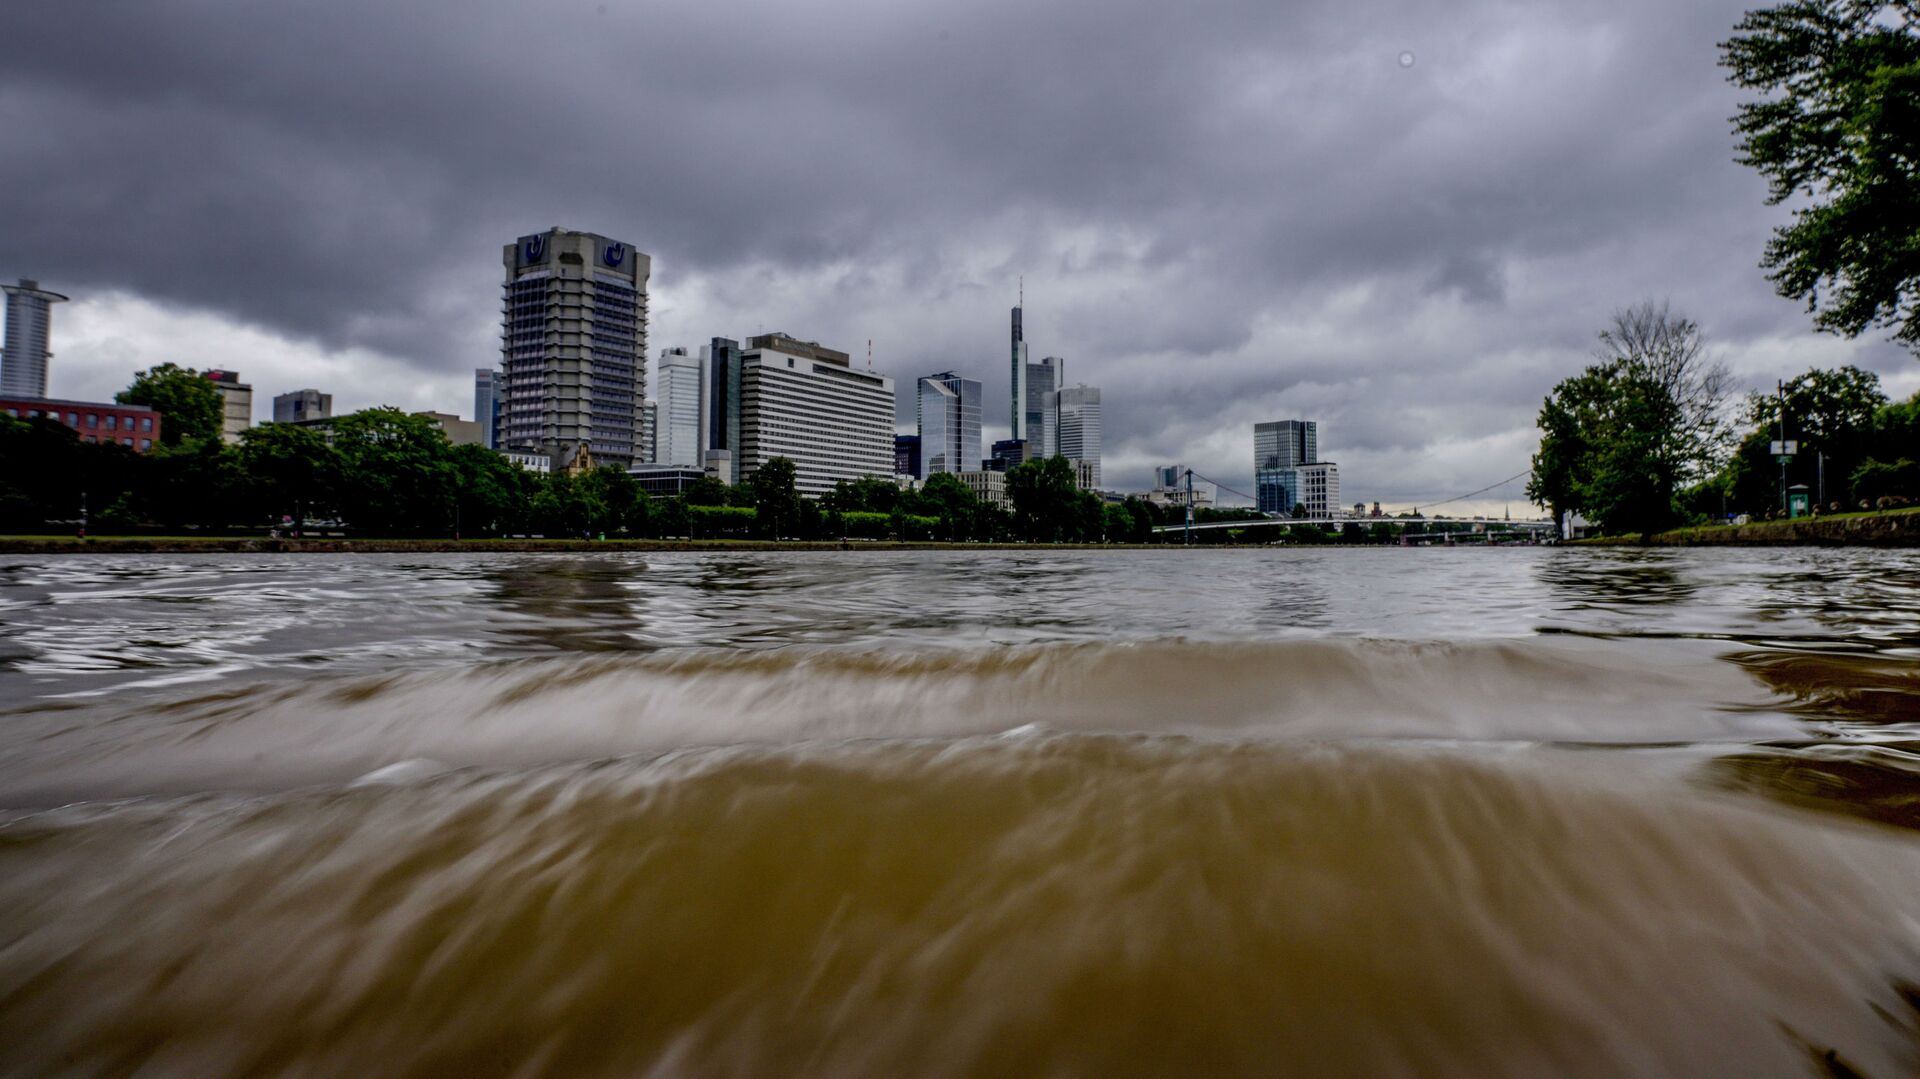 Разлившаяся река Майн во Франкфурте, Германия - Sputnik Латвия, 1920, 20.07.2021